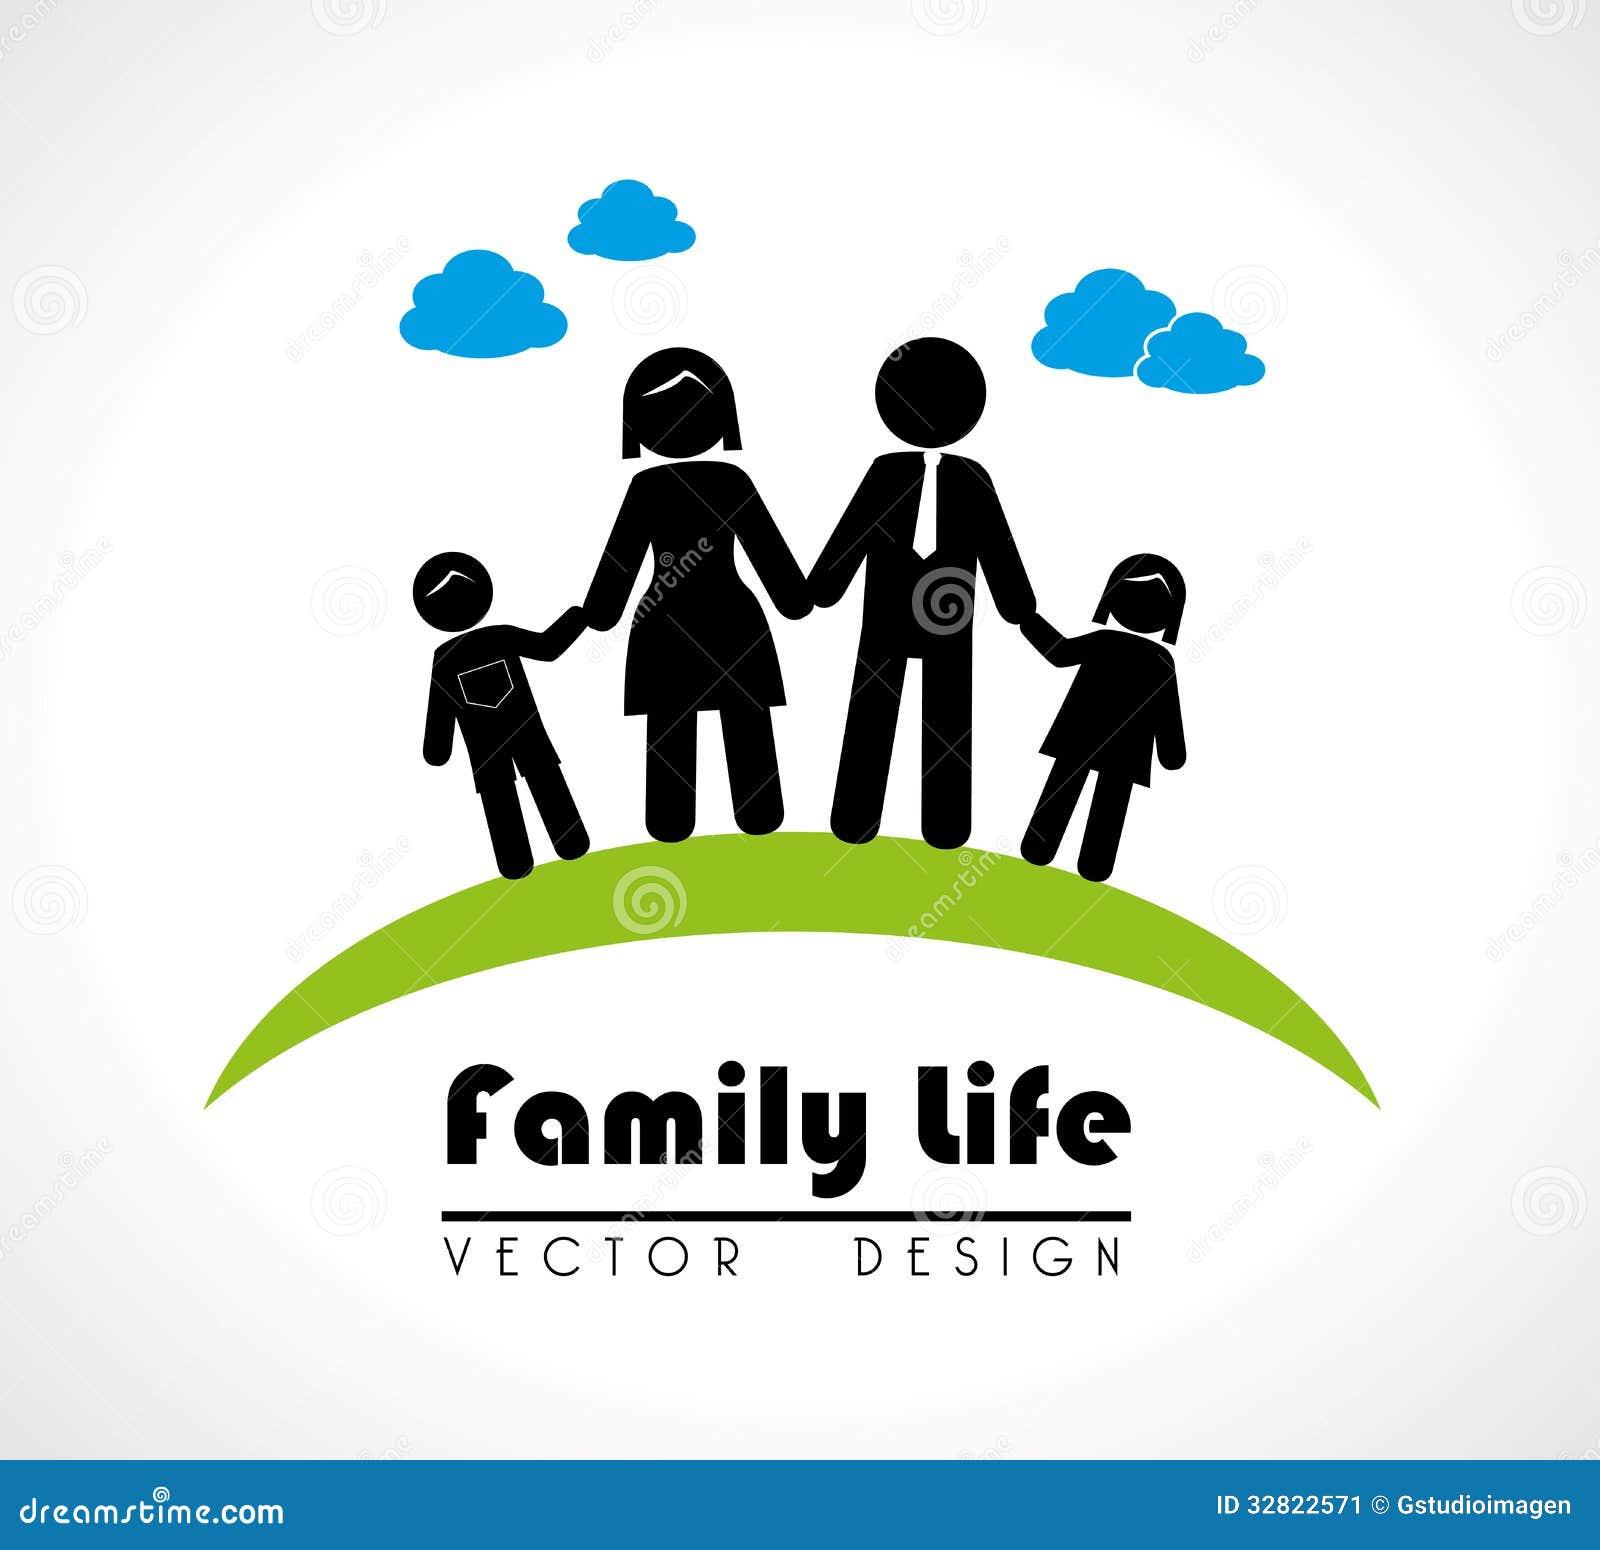 famili images